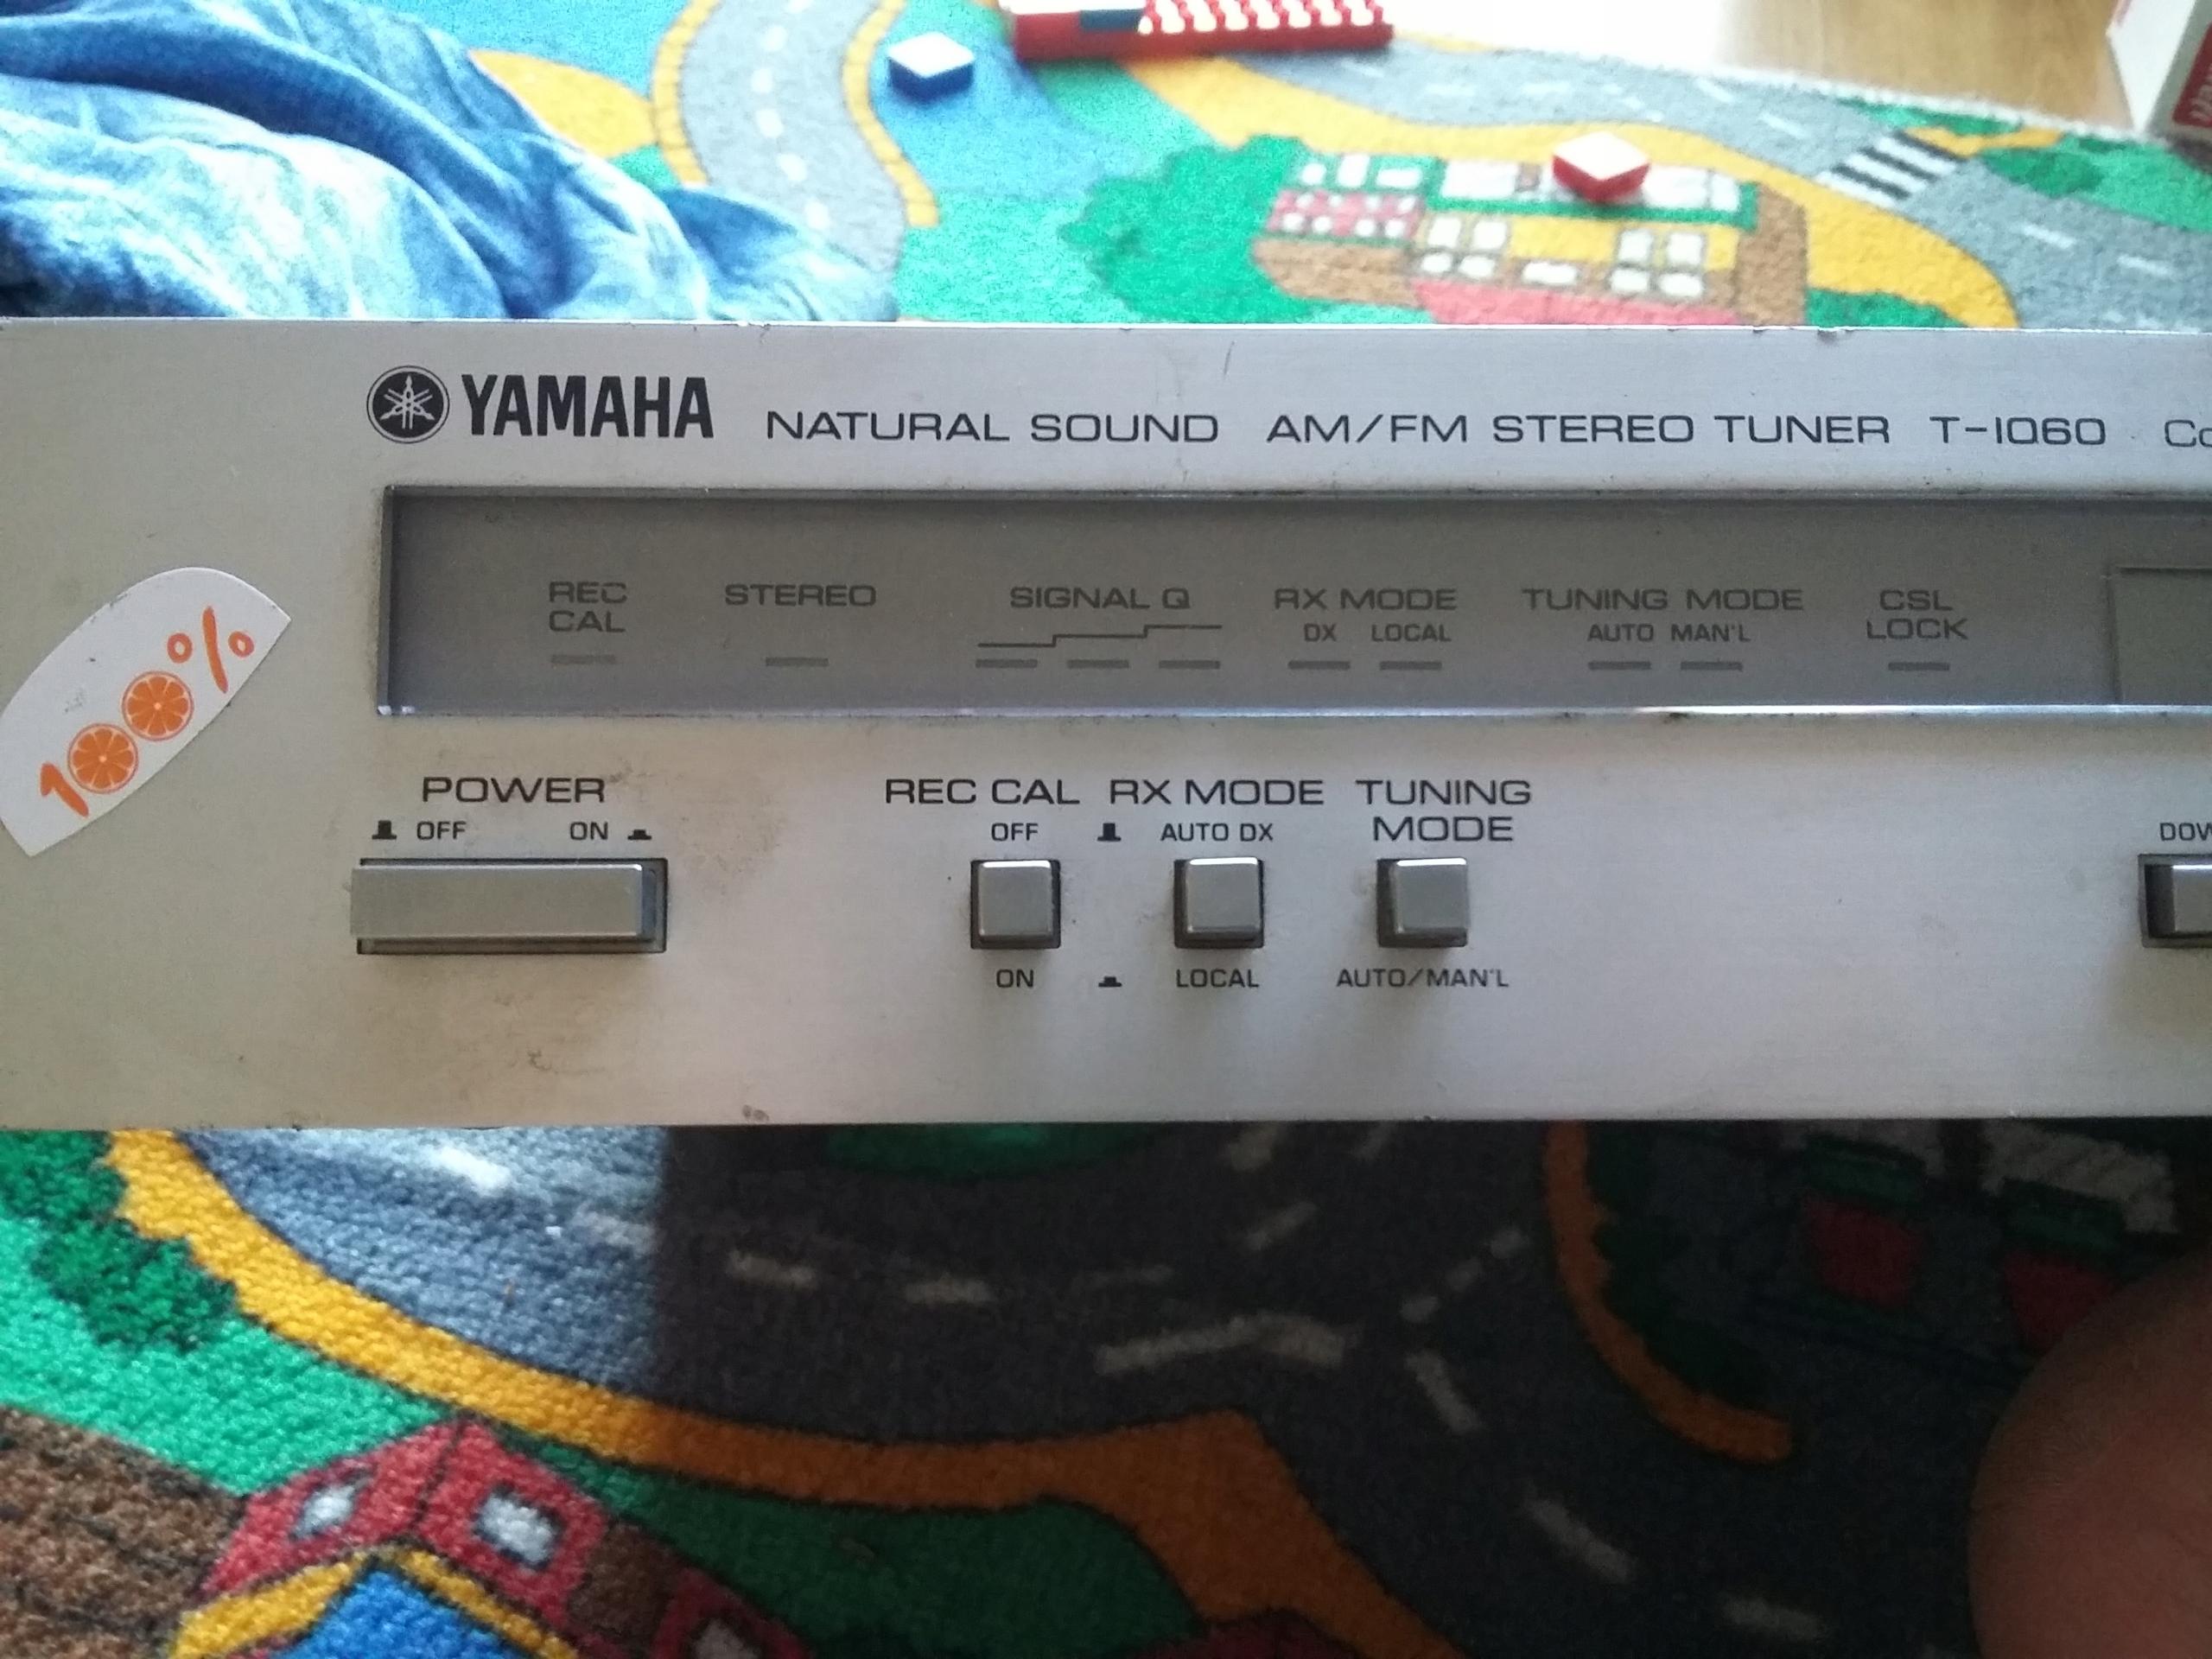 YAMAHA NATURAL SOUND AM/FM TUNER T-1060 RADIO FVAT